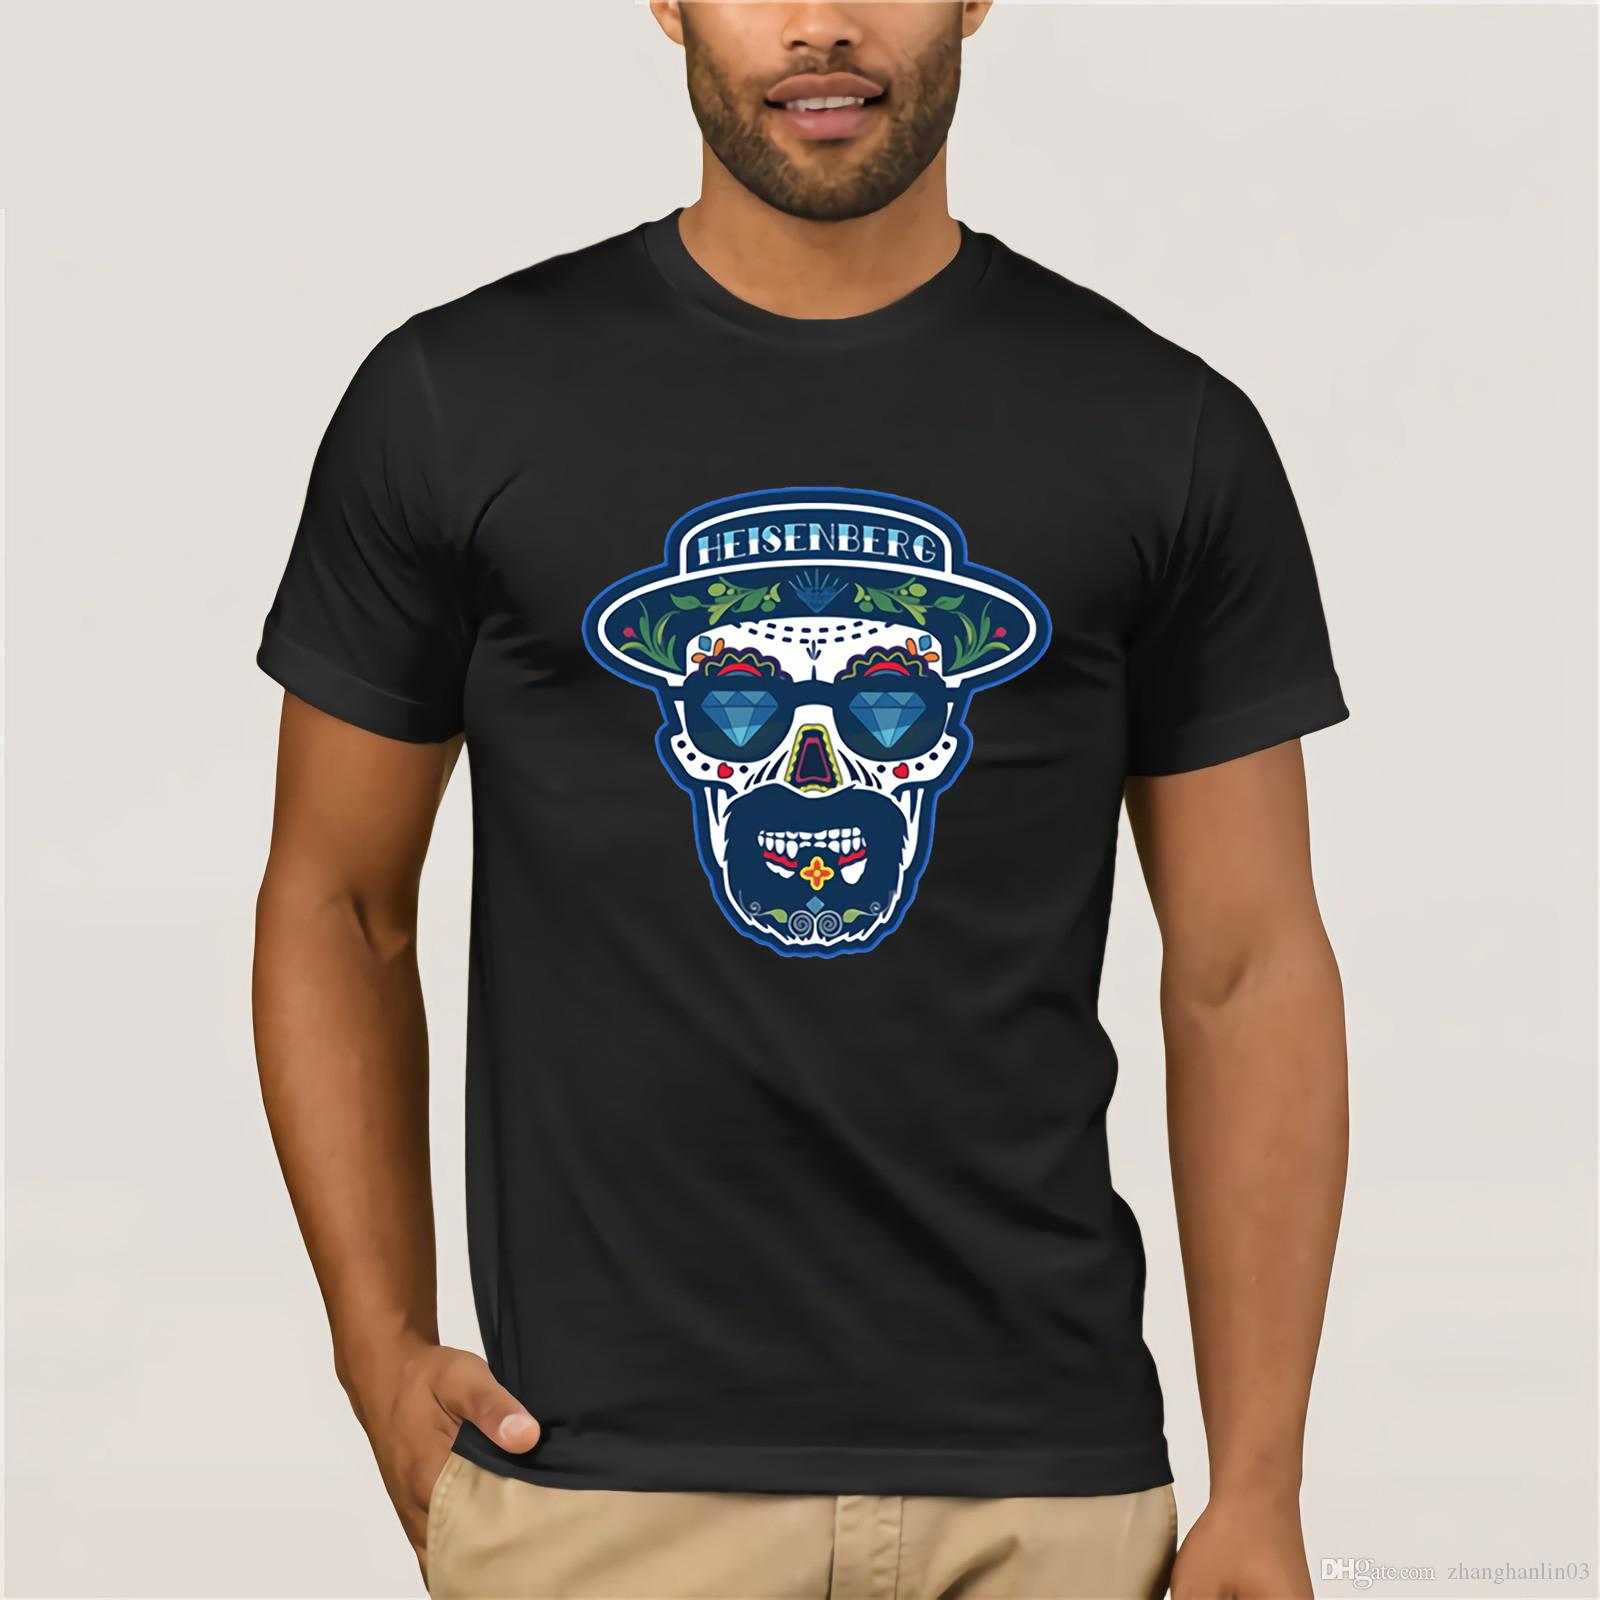 65d37f4947600 Camisetas Heisenberg Breaking Bad T Shirt Men Hermanos Cotton Short Hipster  Tees Walter White Cook Swag Heisenberg Men S T Shirt Ridiculous Shirts  Awesome ...